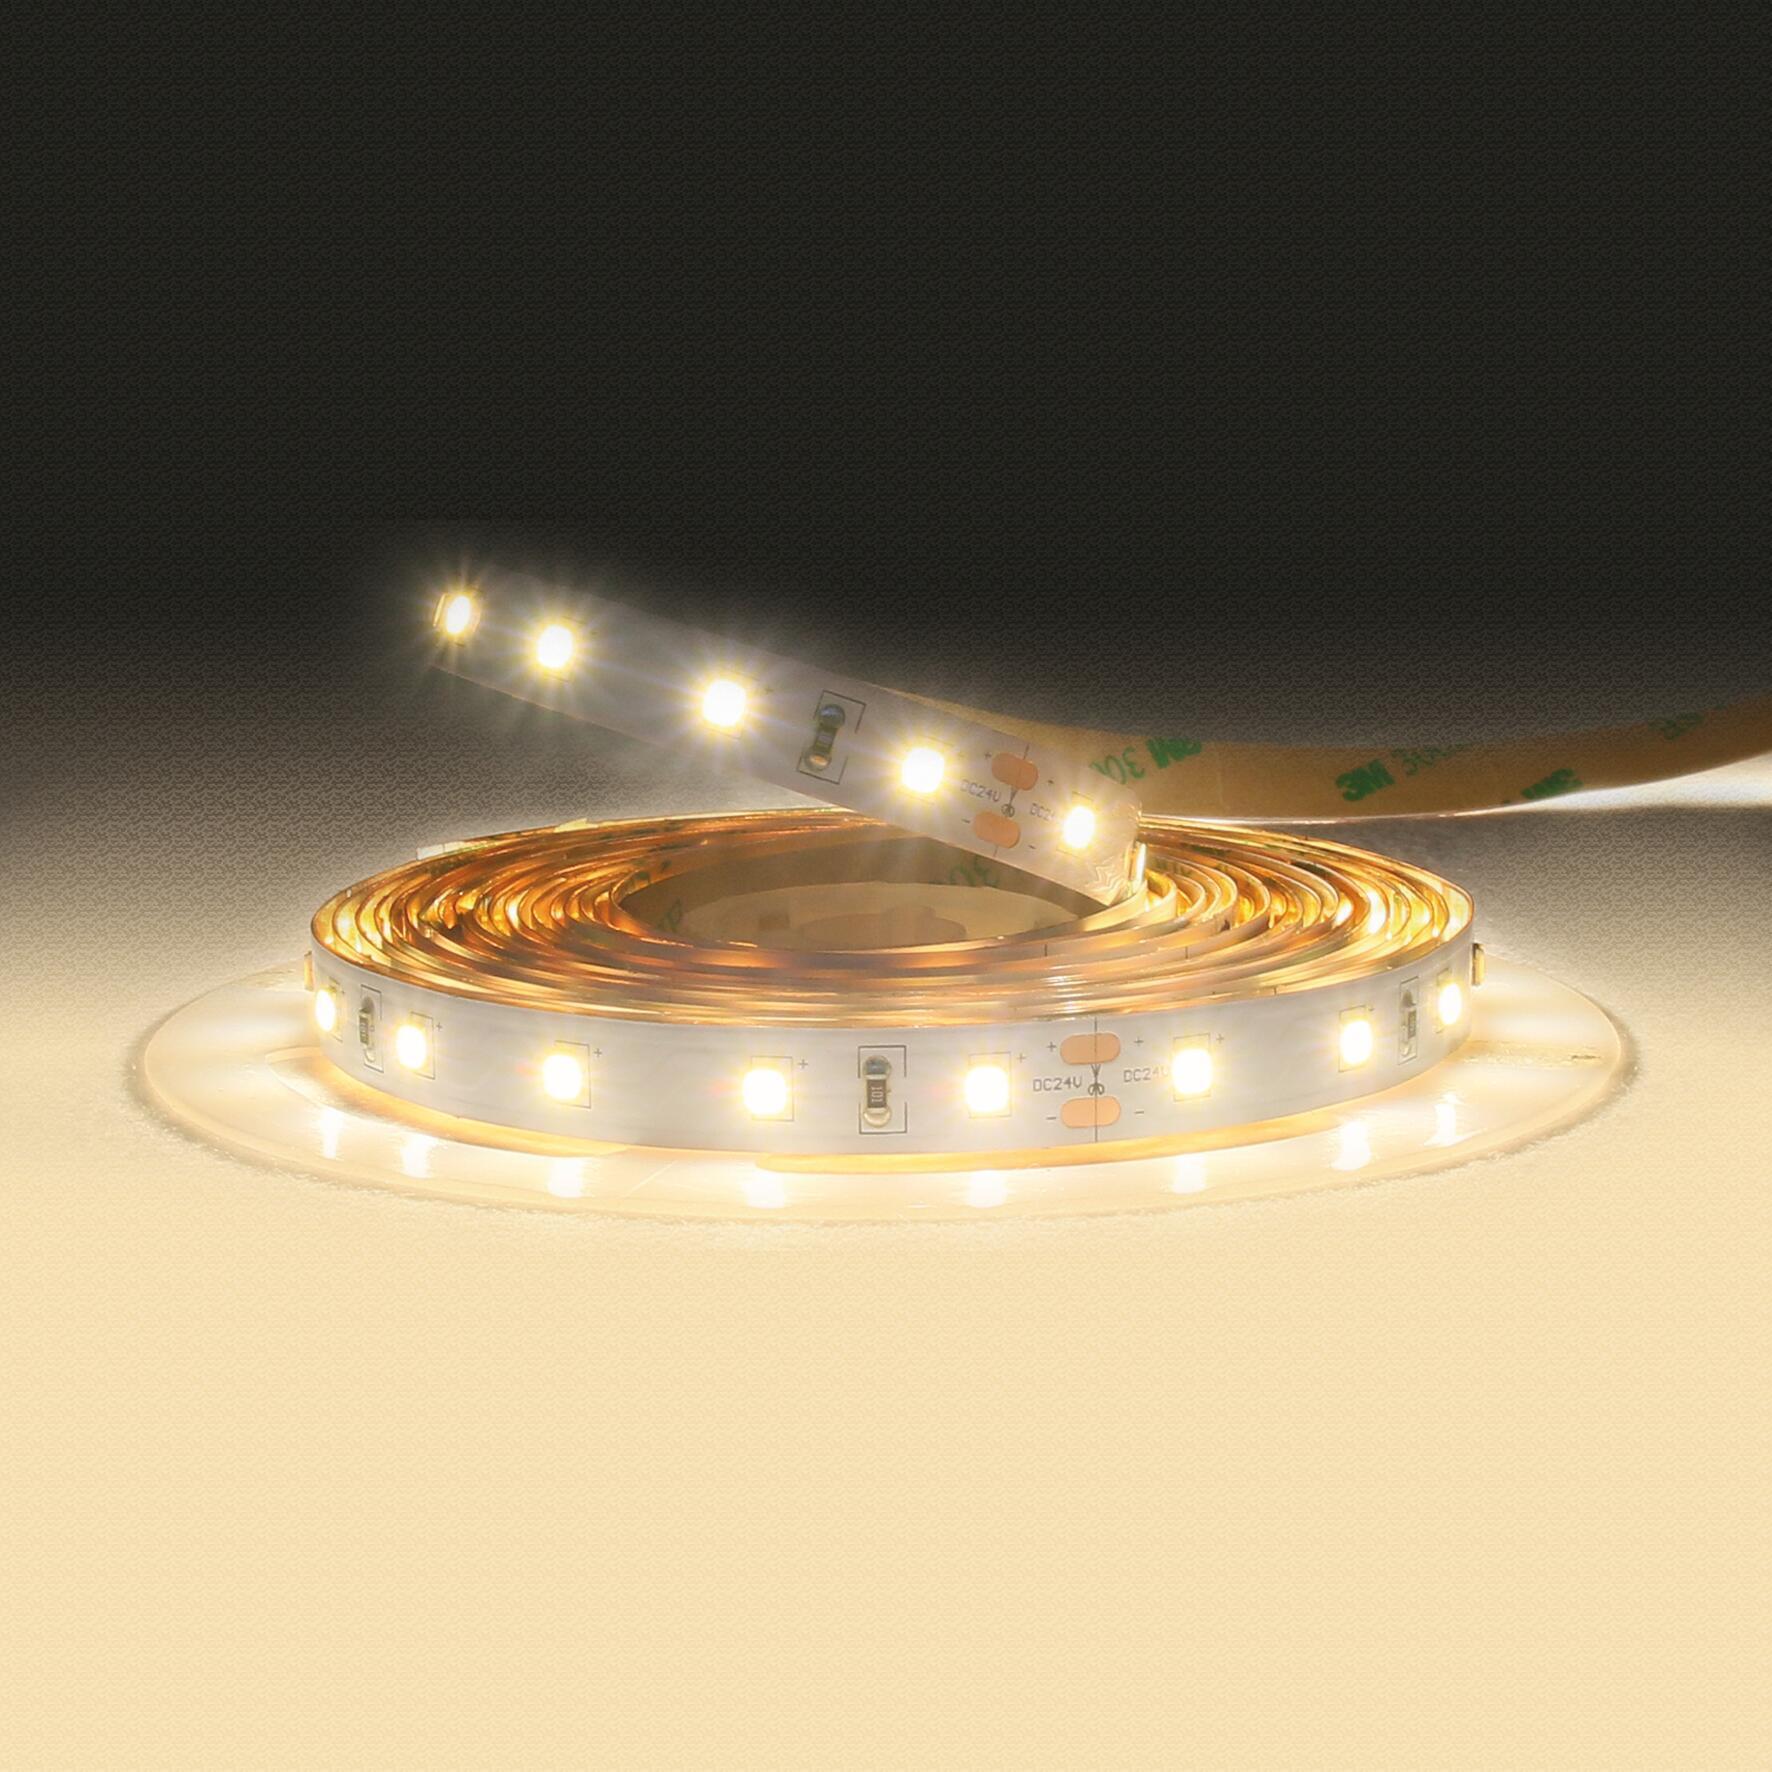 Striscia led Stripled20 5m luce bianco naturale 1050LM IP20 - 1